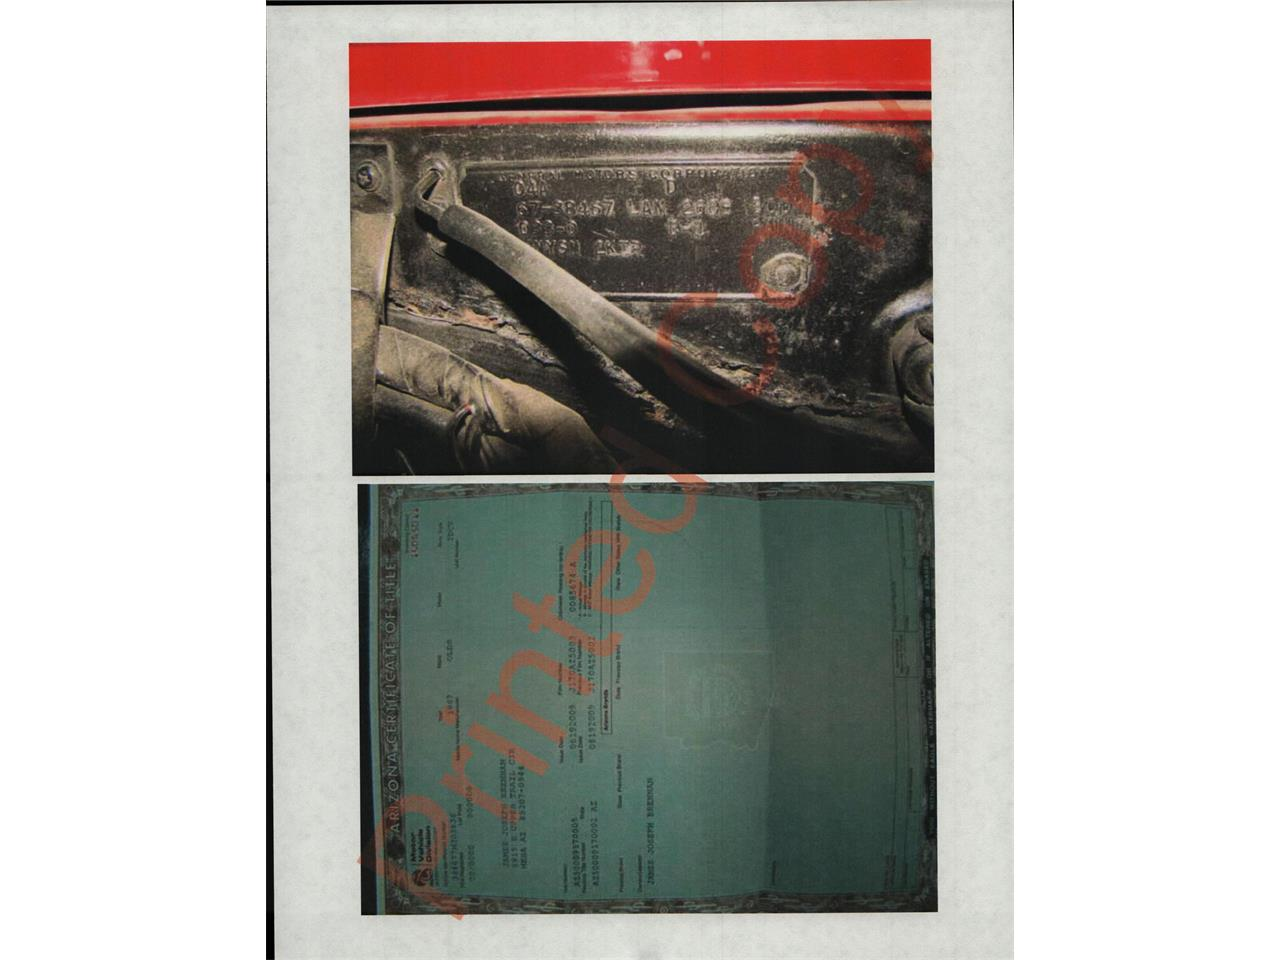 Large Picture of Classic 1967 98 located in GILBERT Arizona - $28,500.00 - QIZI